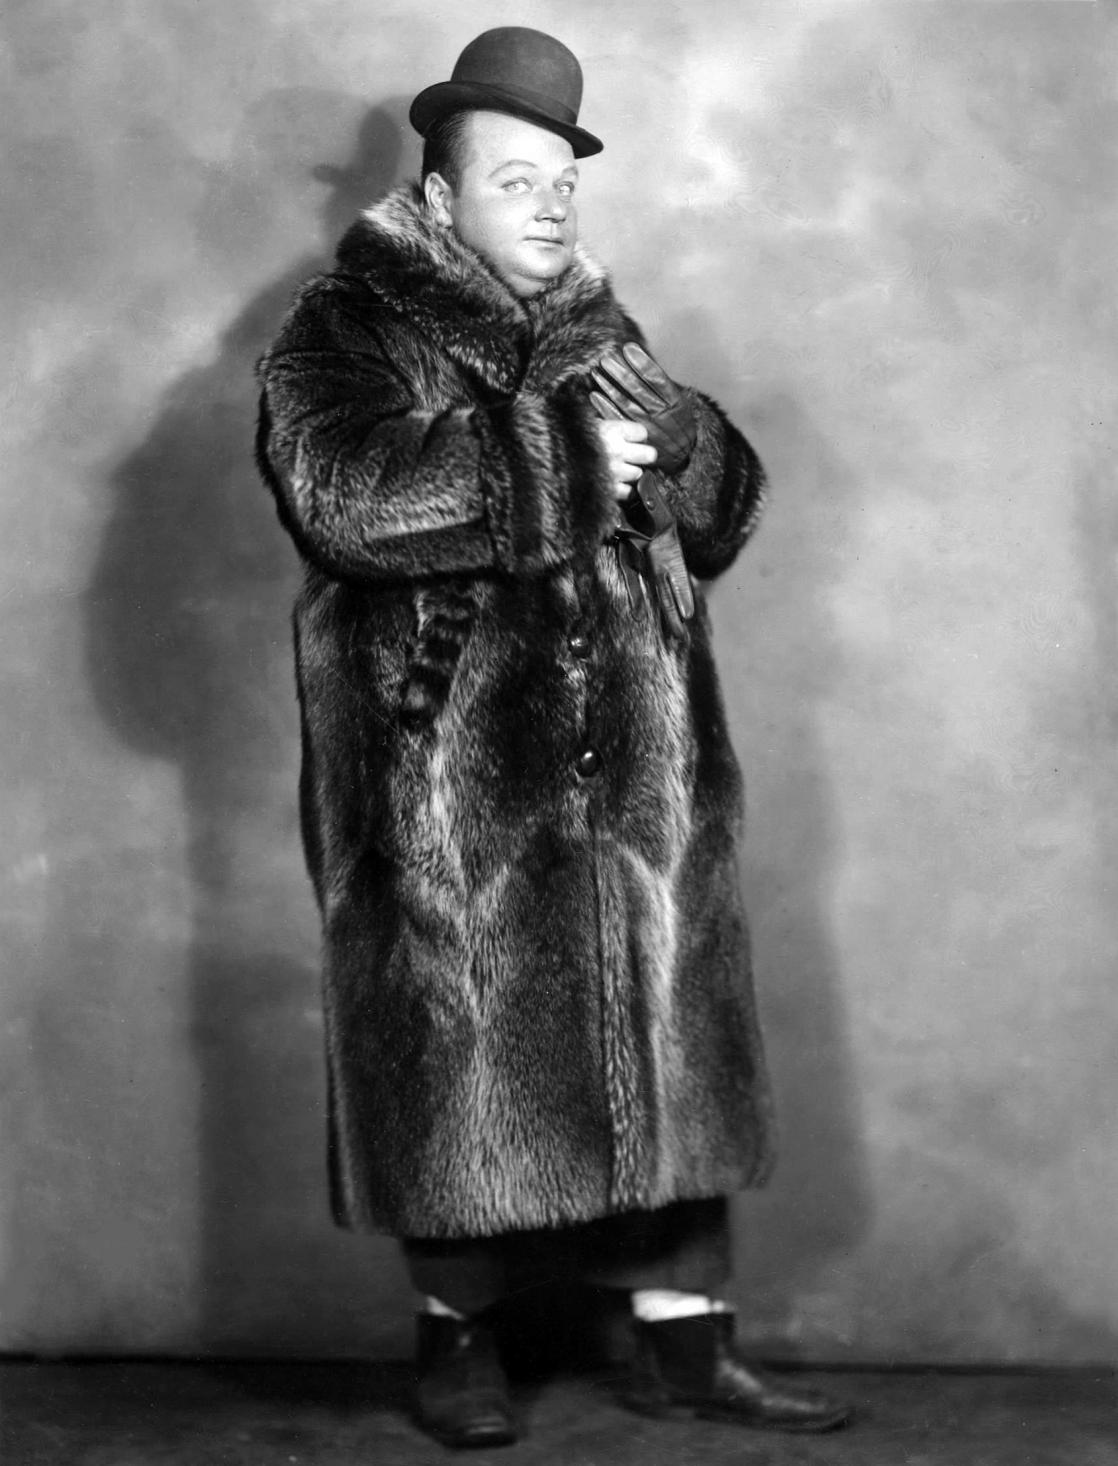 Roscoe 'Fatty' Arbuckle